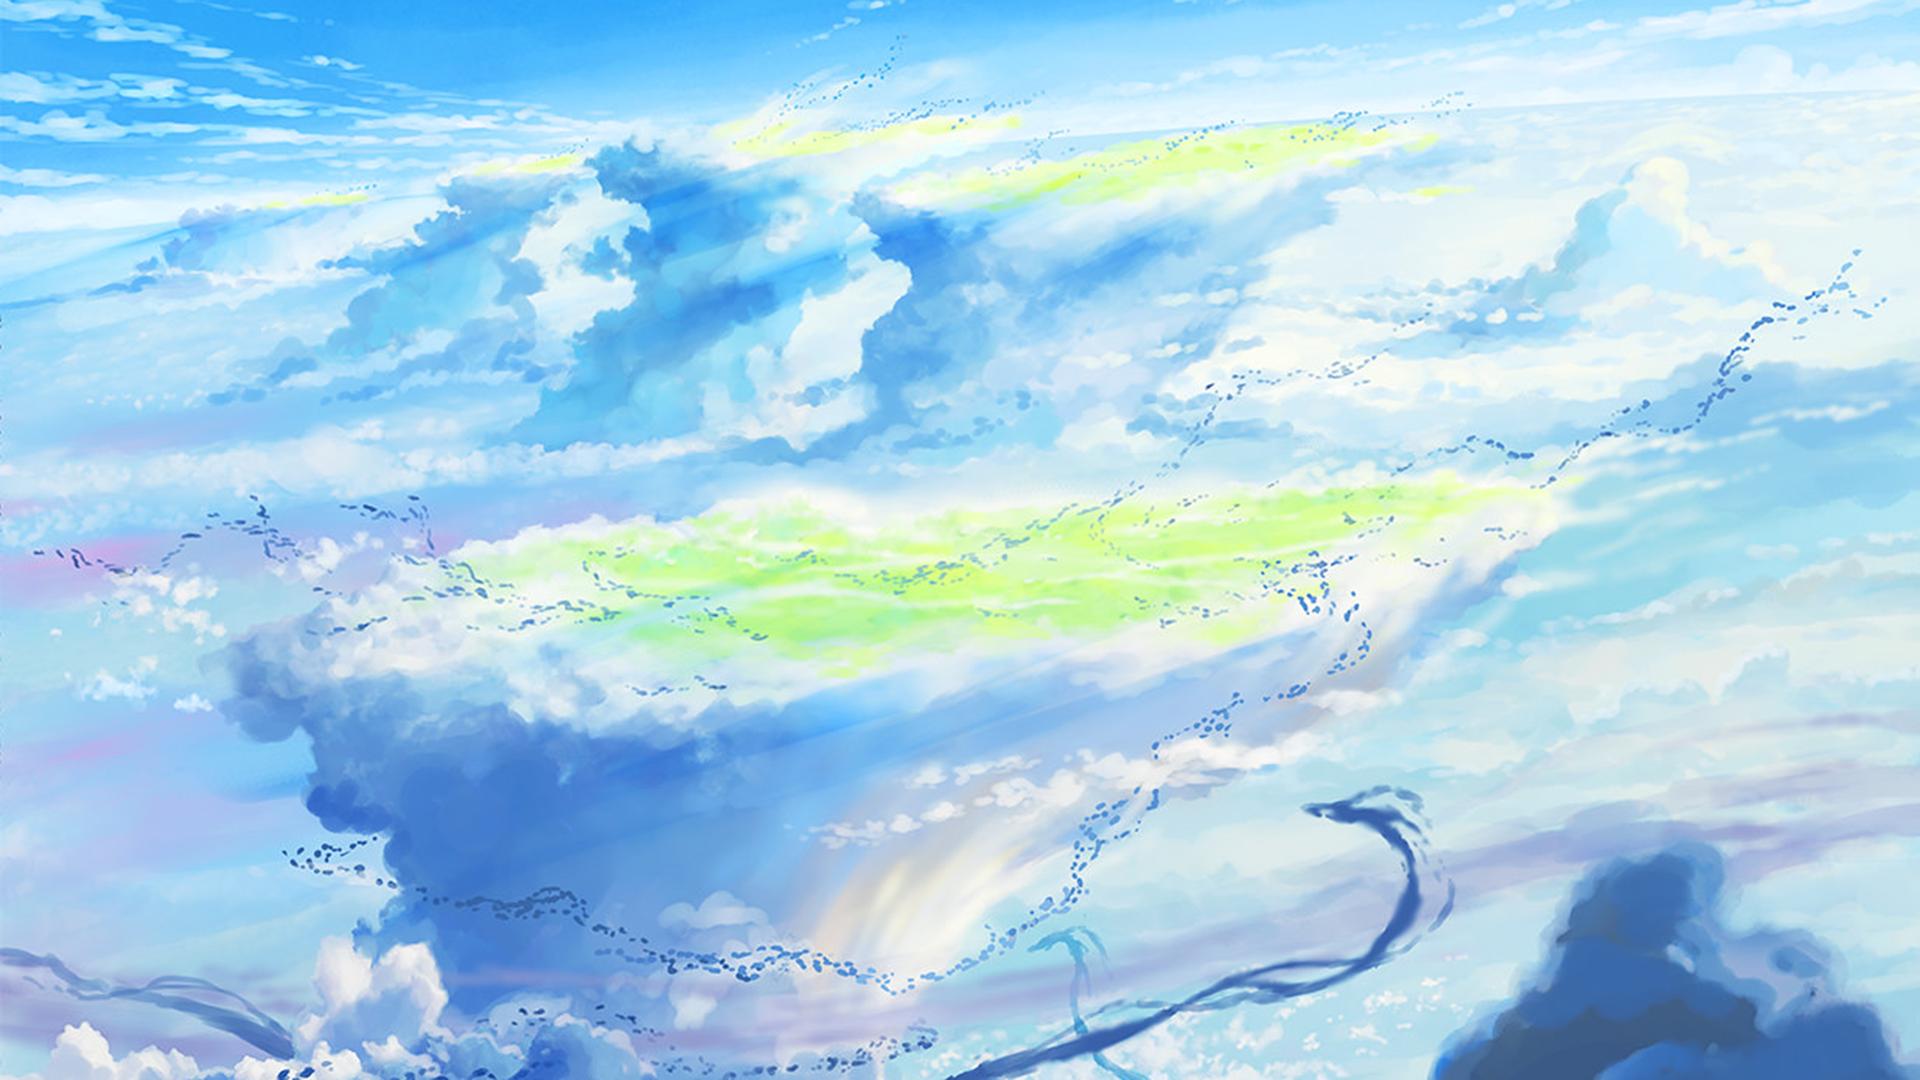 Wallpaper Weathering With You Makoto Shinkai Anime Blue Sky Clouds 1920x1080 Simplymemes 1531725 Hd Wallpapers Wallhere